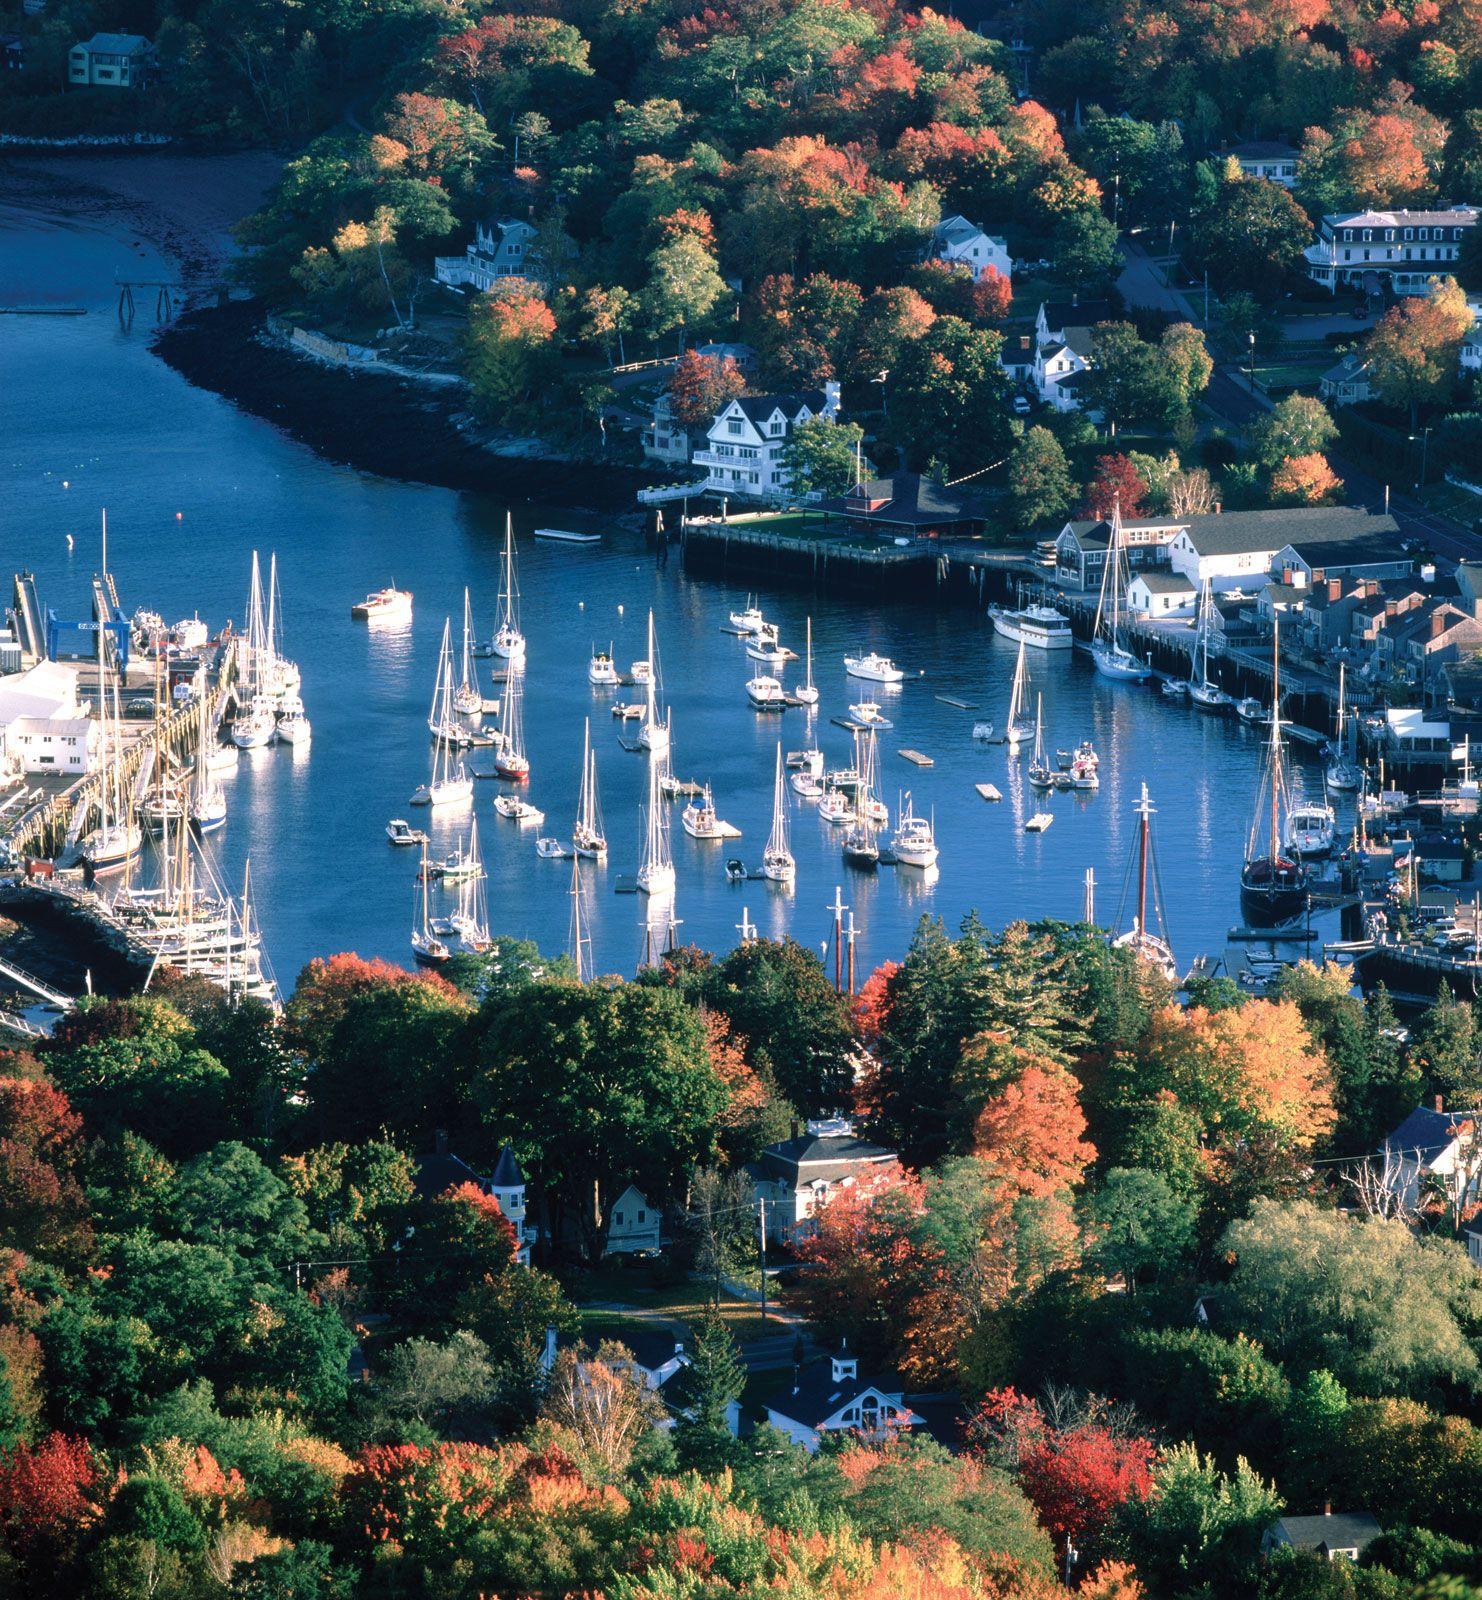 Camden Harbor, Maine Beautiful New England harbor town. I